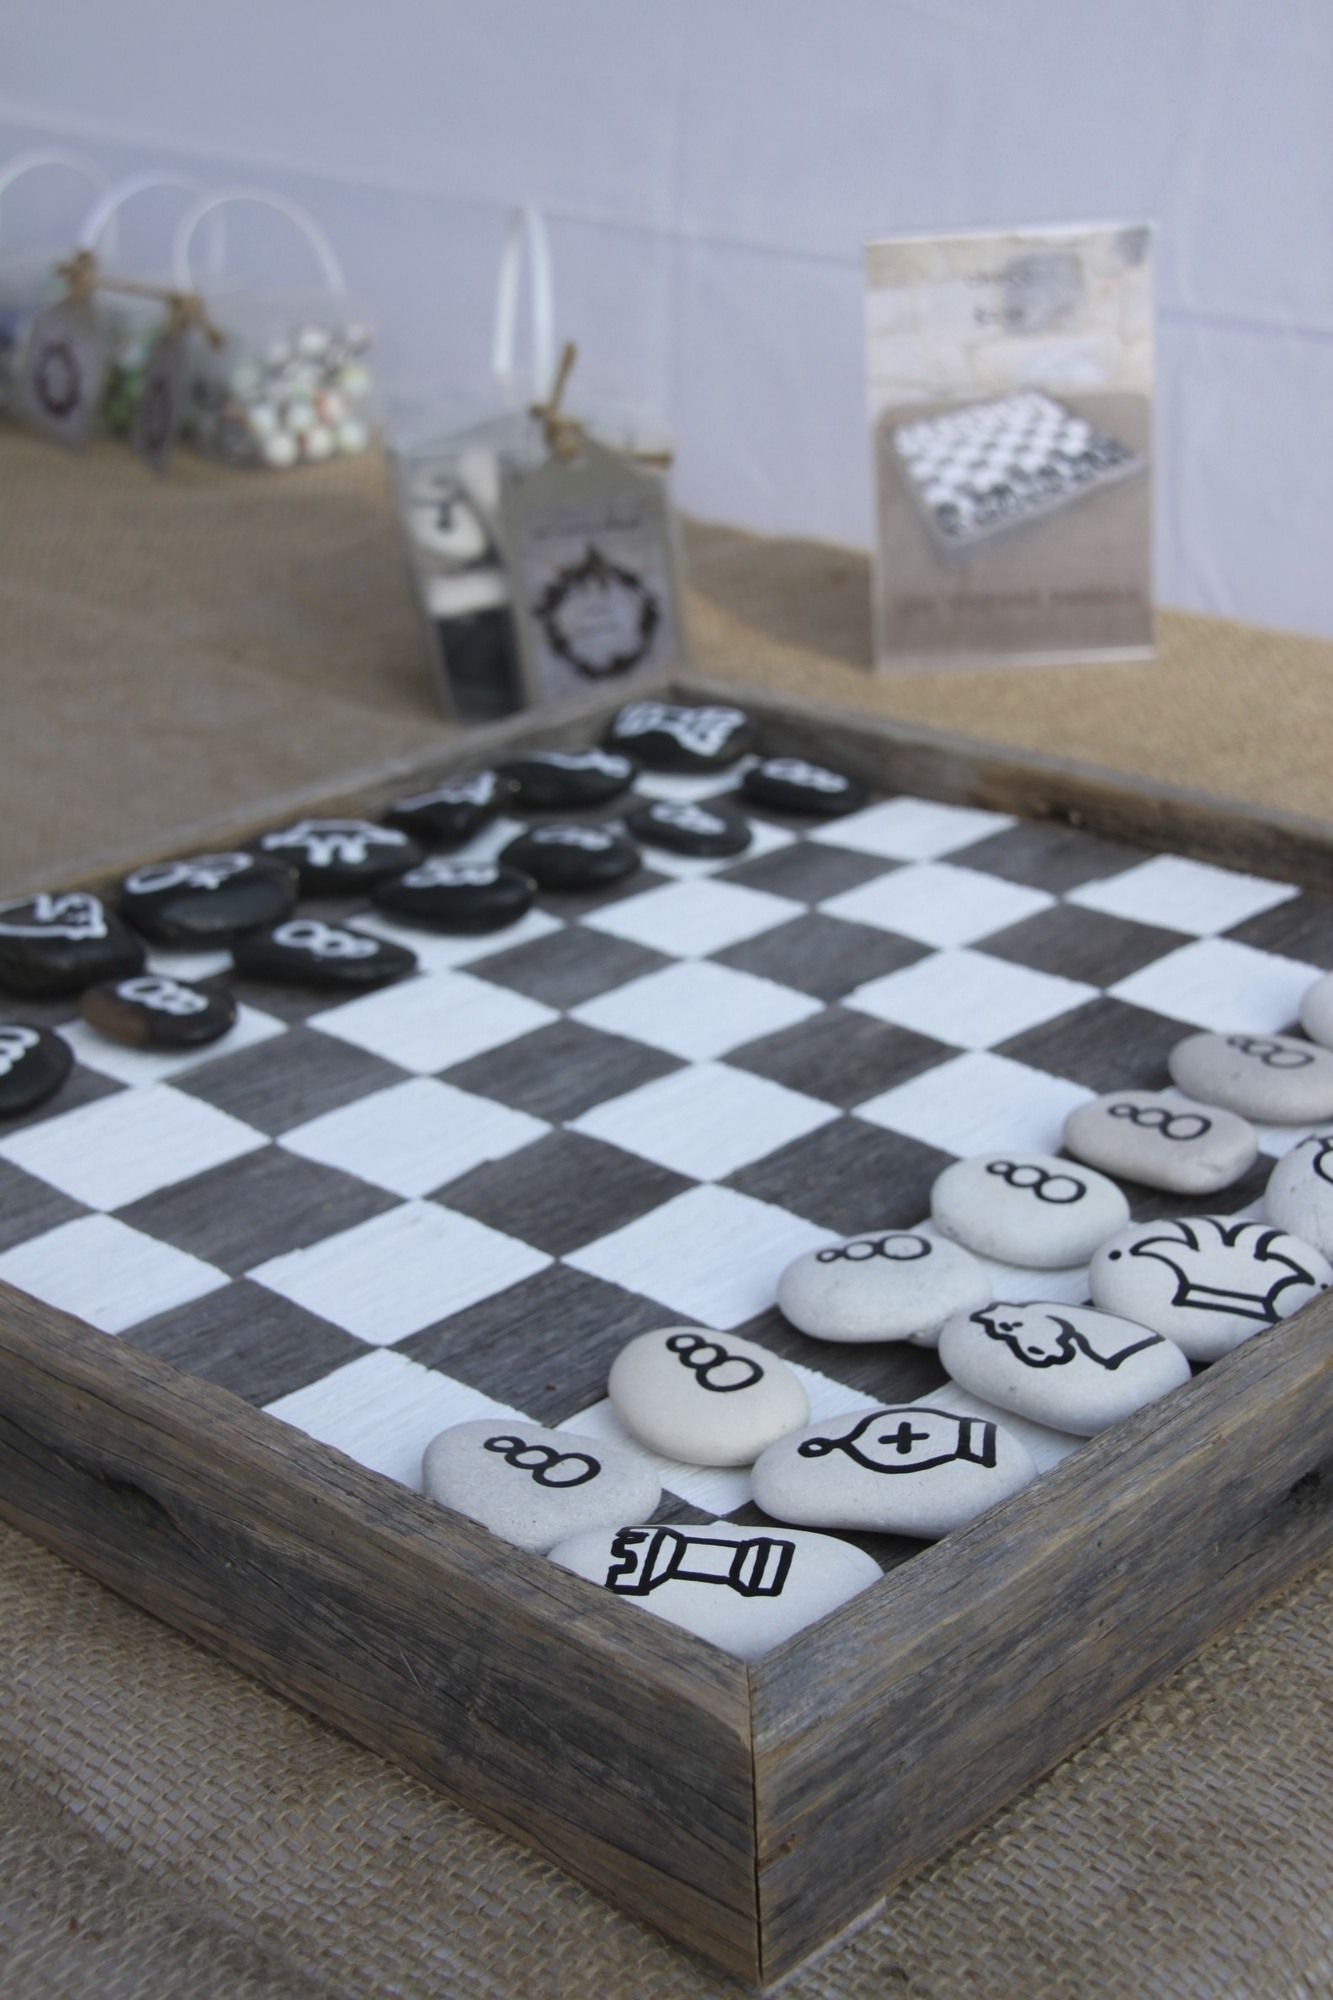 damas o ajedrez con piezas pintadas en piedras